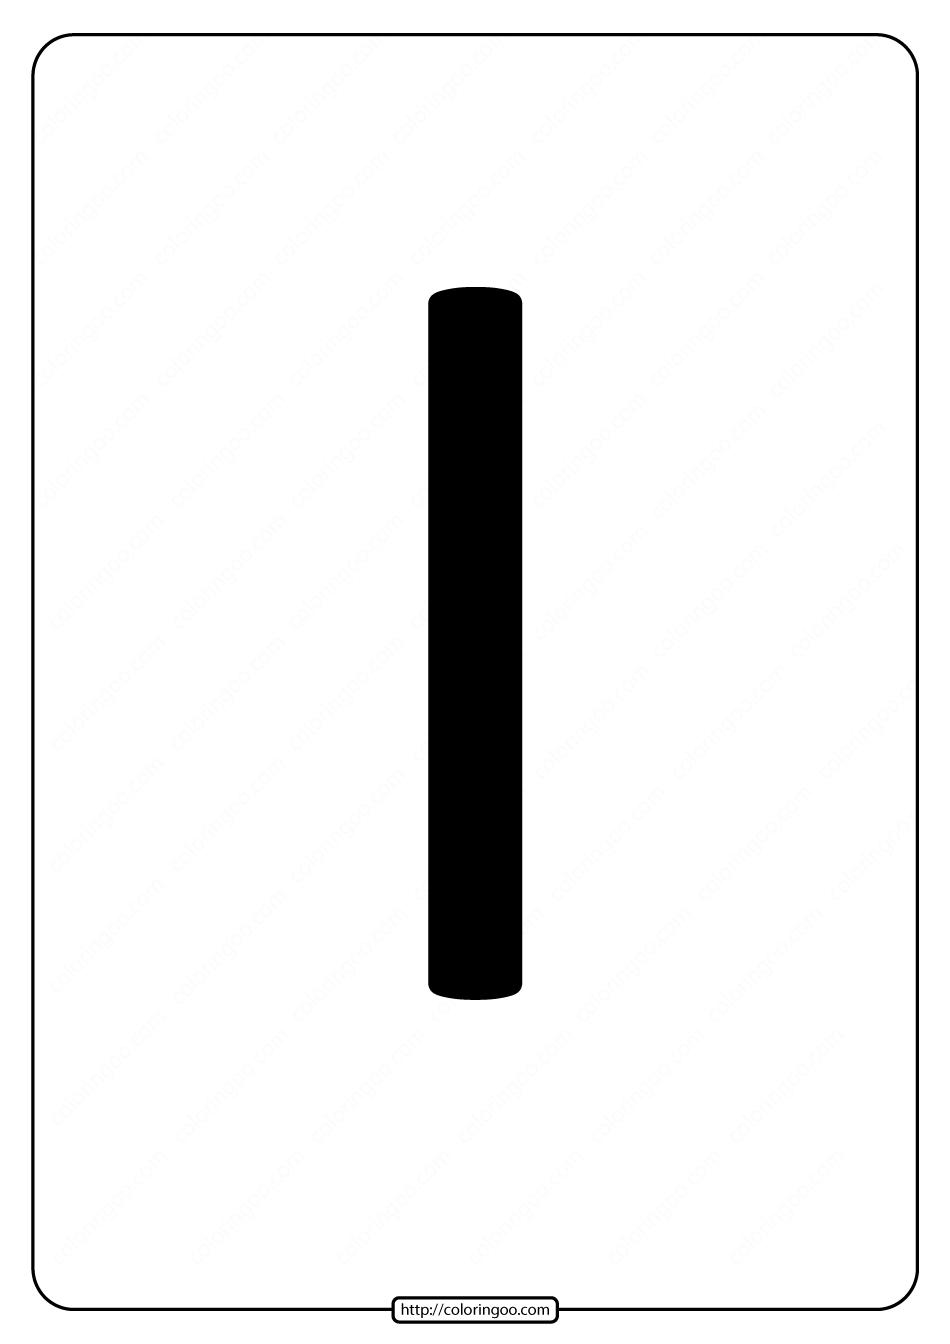 Printable A4 Size Uppercase Letters I Worksheet